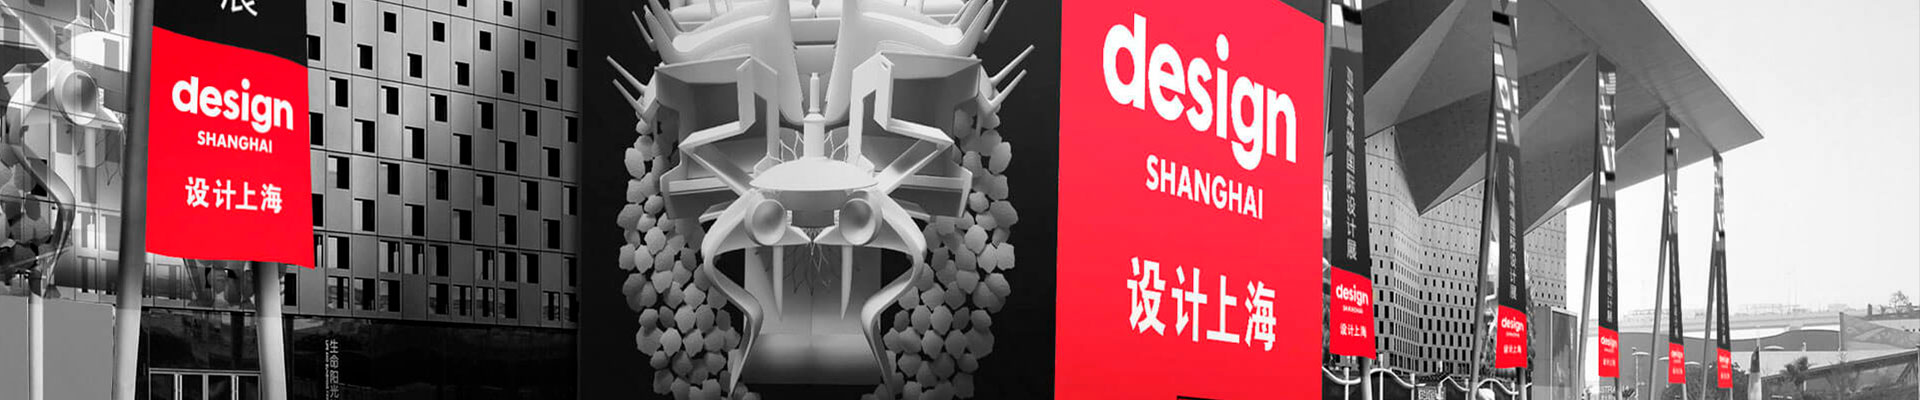 agglotech-news-fiera-design-shanghai-header